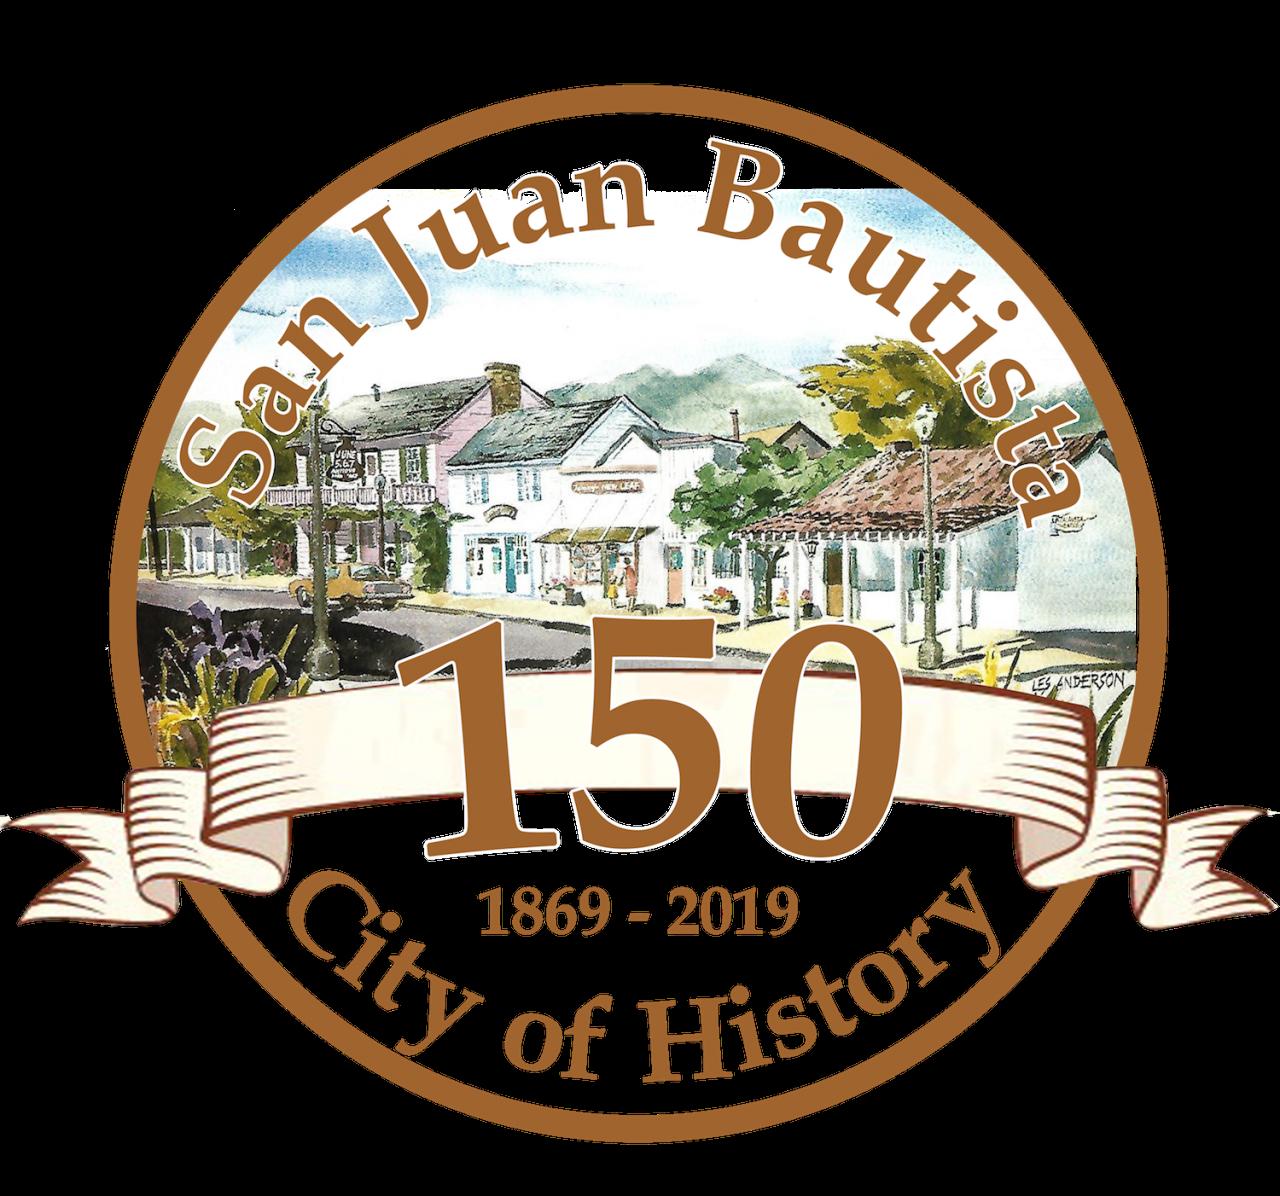 San Juan Bautista Celebrates 150 logo. Provided by SJB150 Committee.